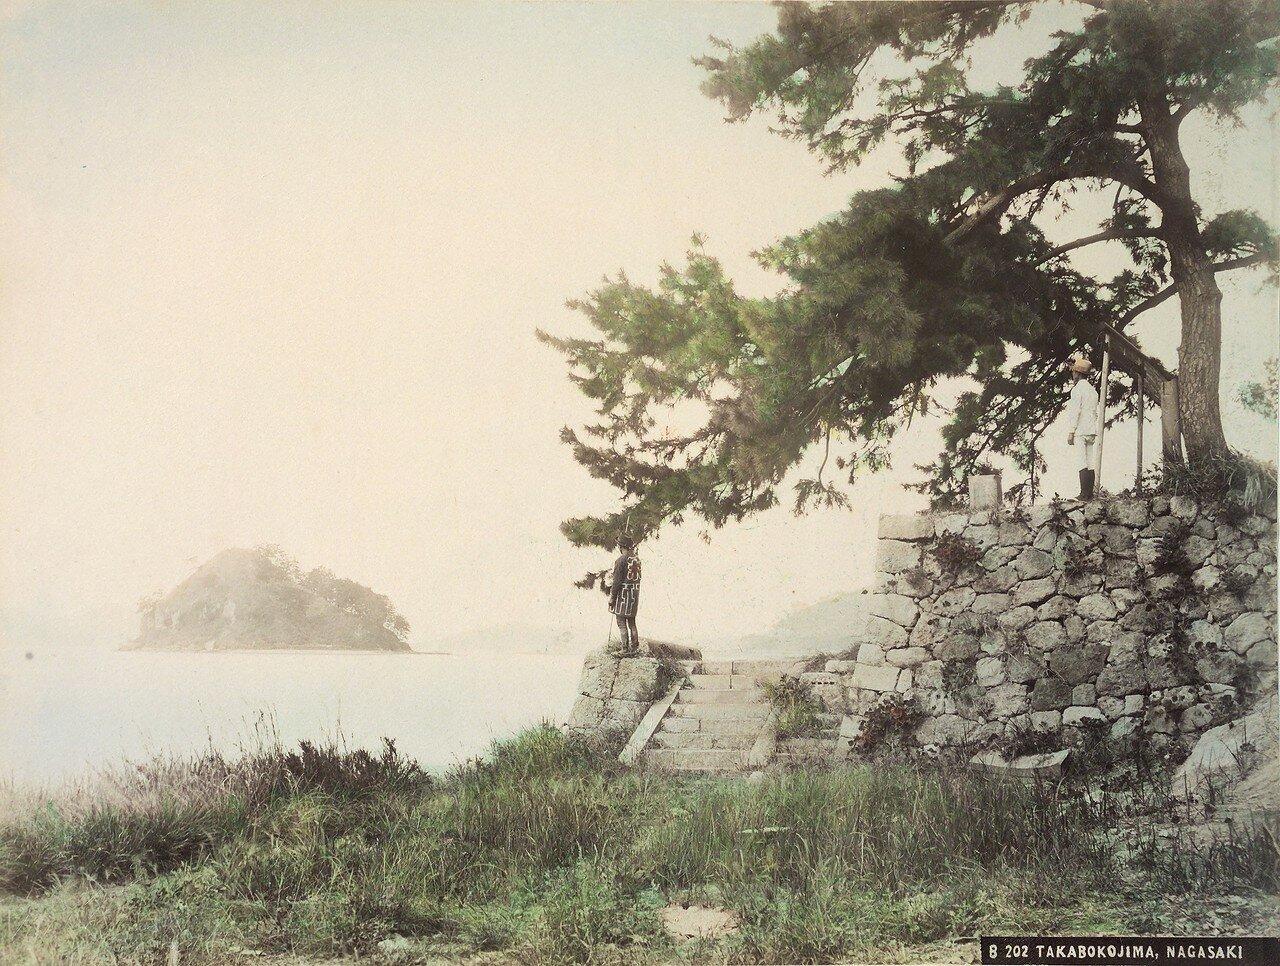 Нагасаки. Остров Така-бока-сима